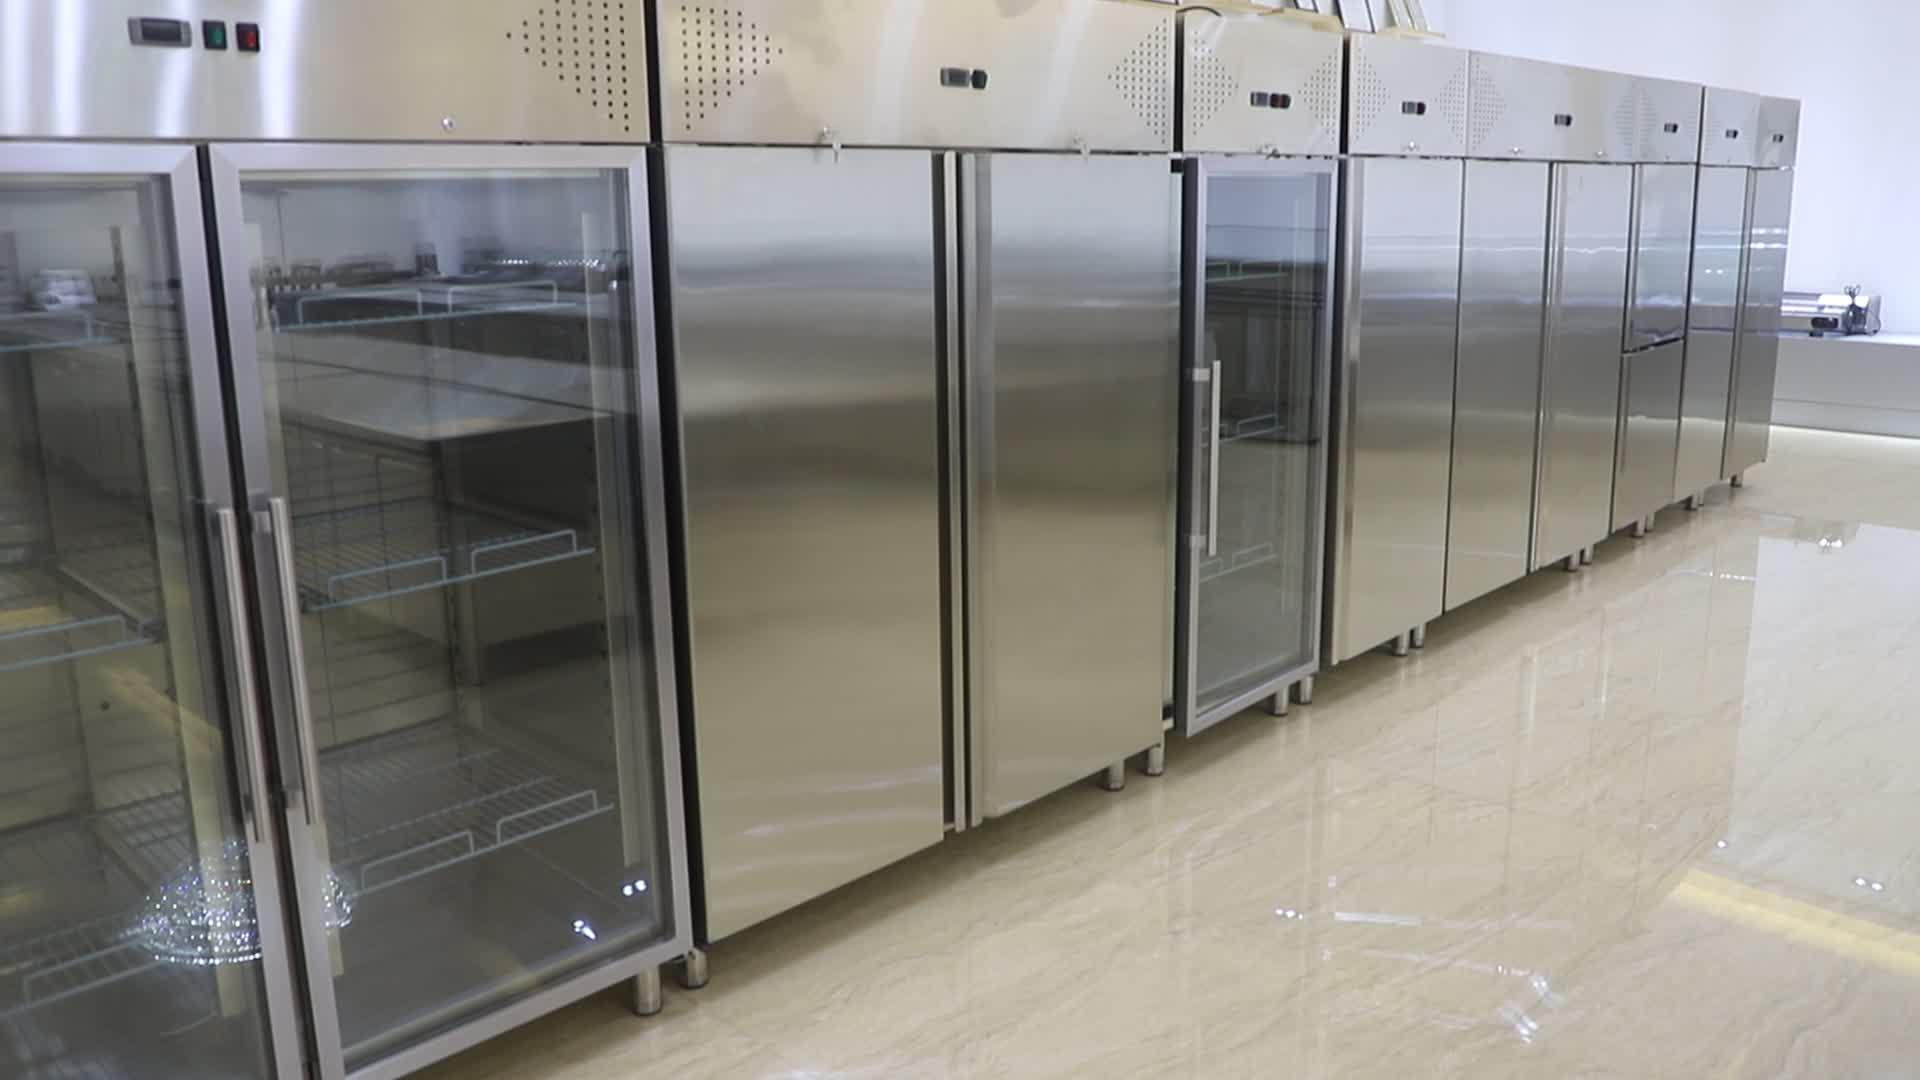 Restaurant Commerciële Rvs Koelkast Vriezer/Dubbele Deur Koelkast Refrigeratoion Apparatuur BN-UC1300R2